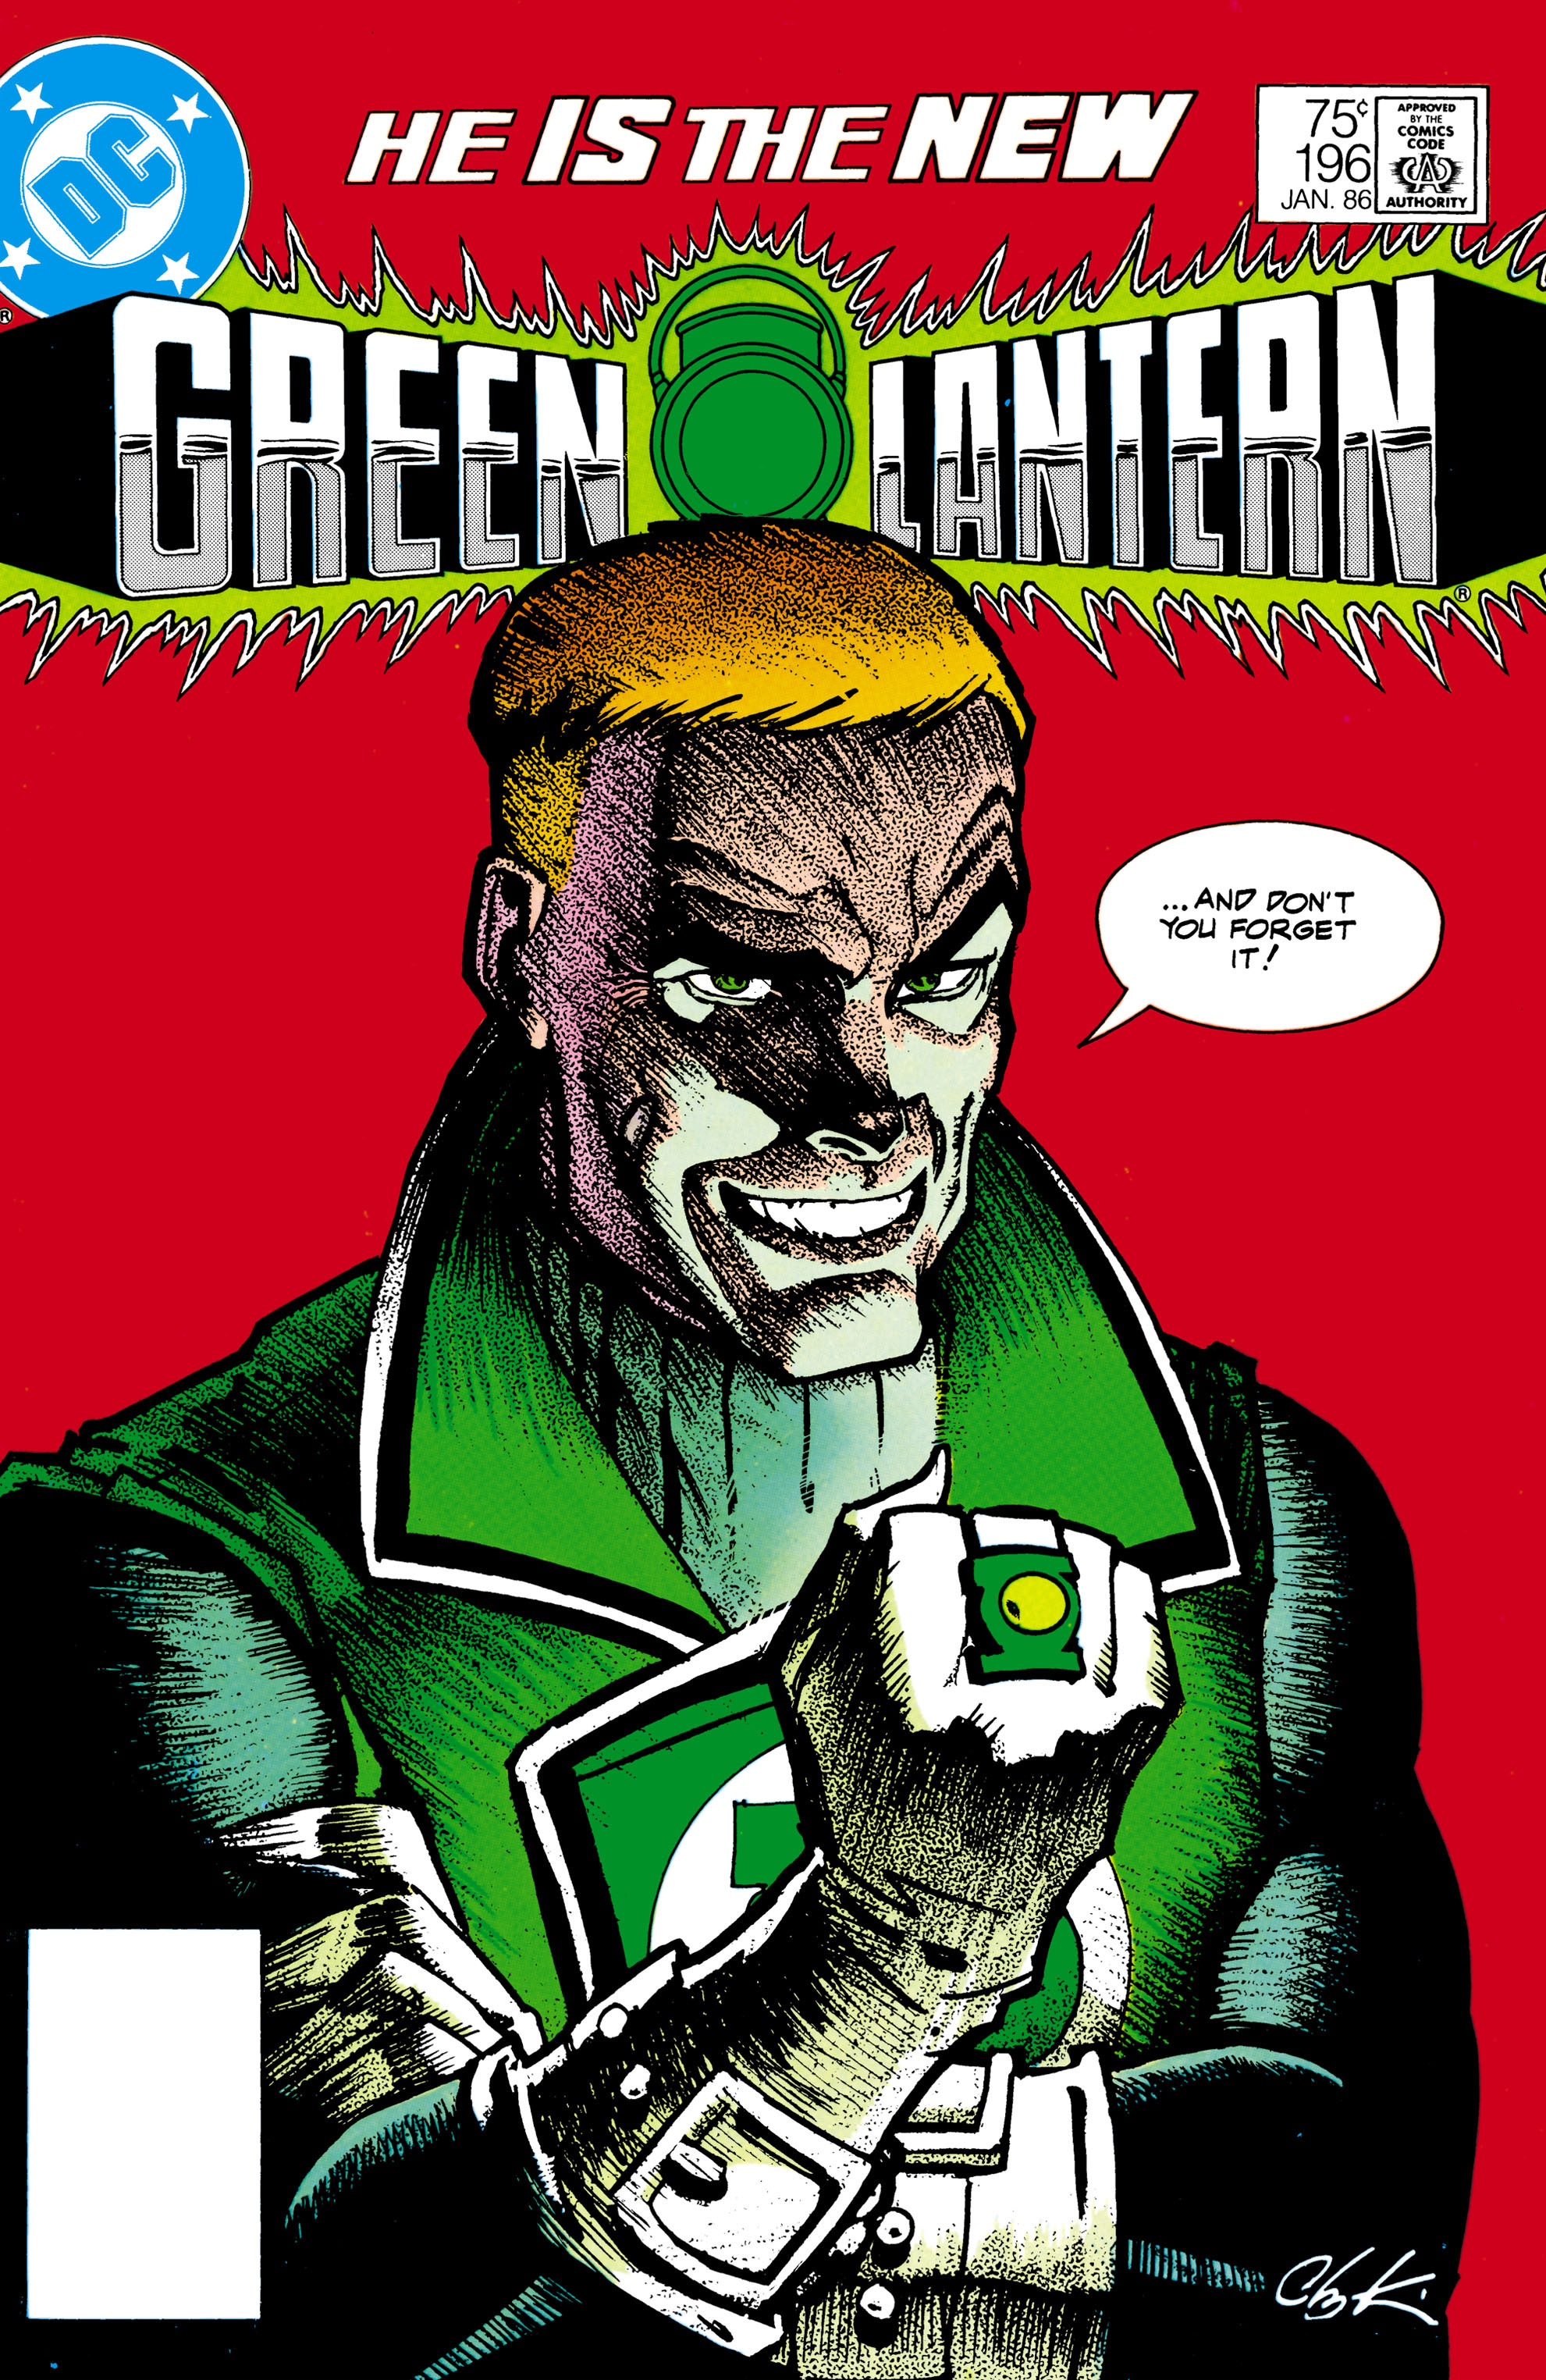 Green Lantern (1960) #196, cover by Howard Chaykin.